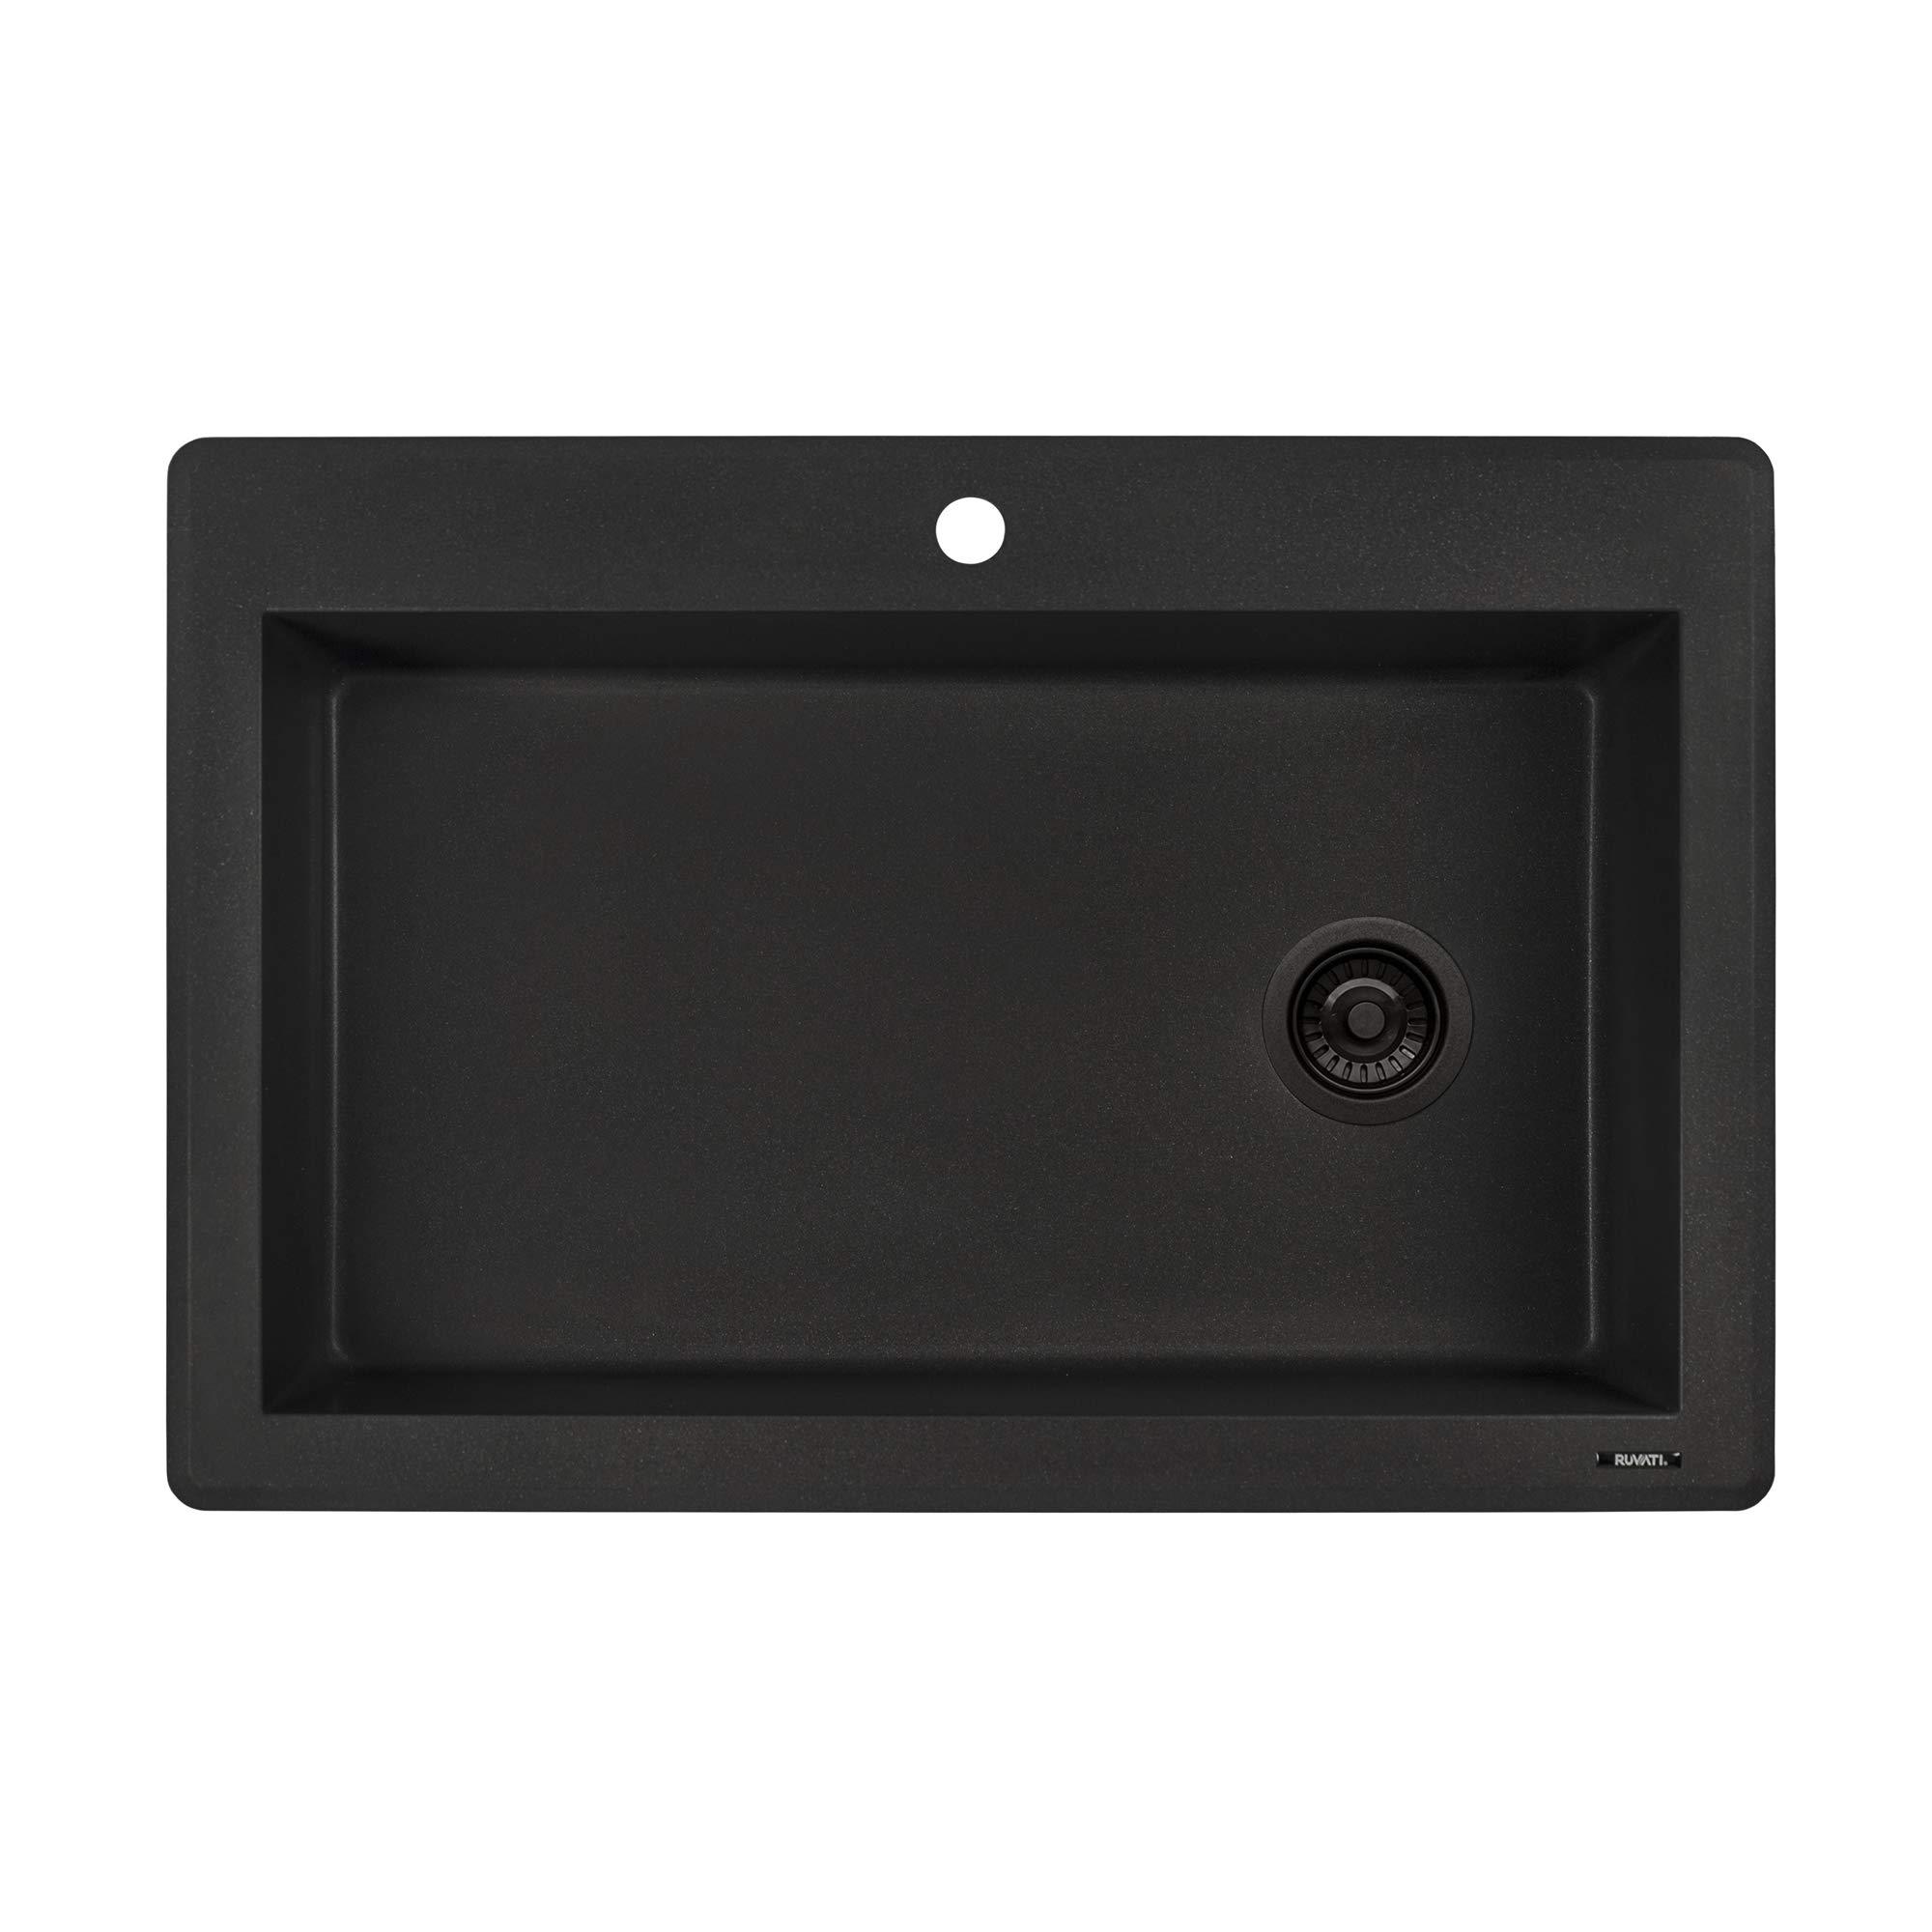 Ruvati 33 x 22 inch Dual-Mount Granite Composite Single Bowl Kitchen Sink - Black Galaxy - RVG1033GX by Ruvati